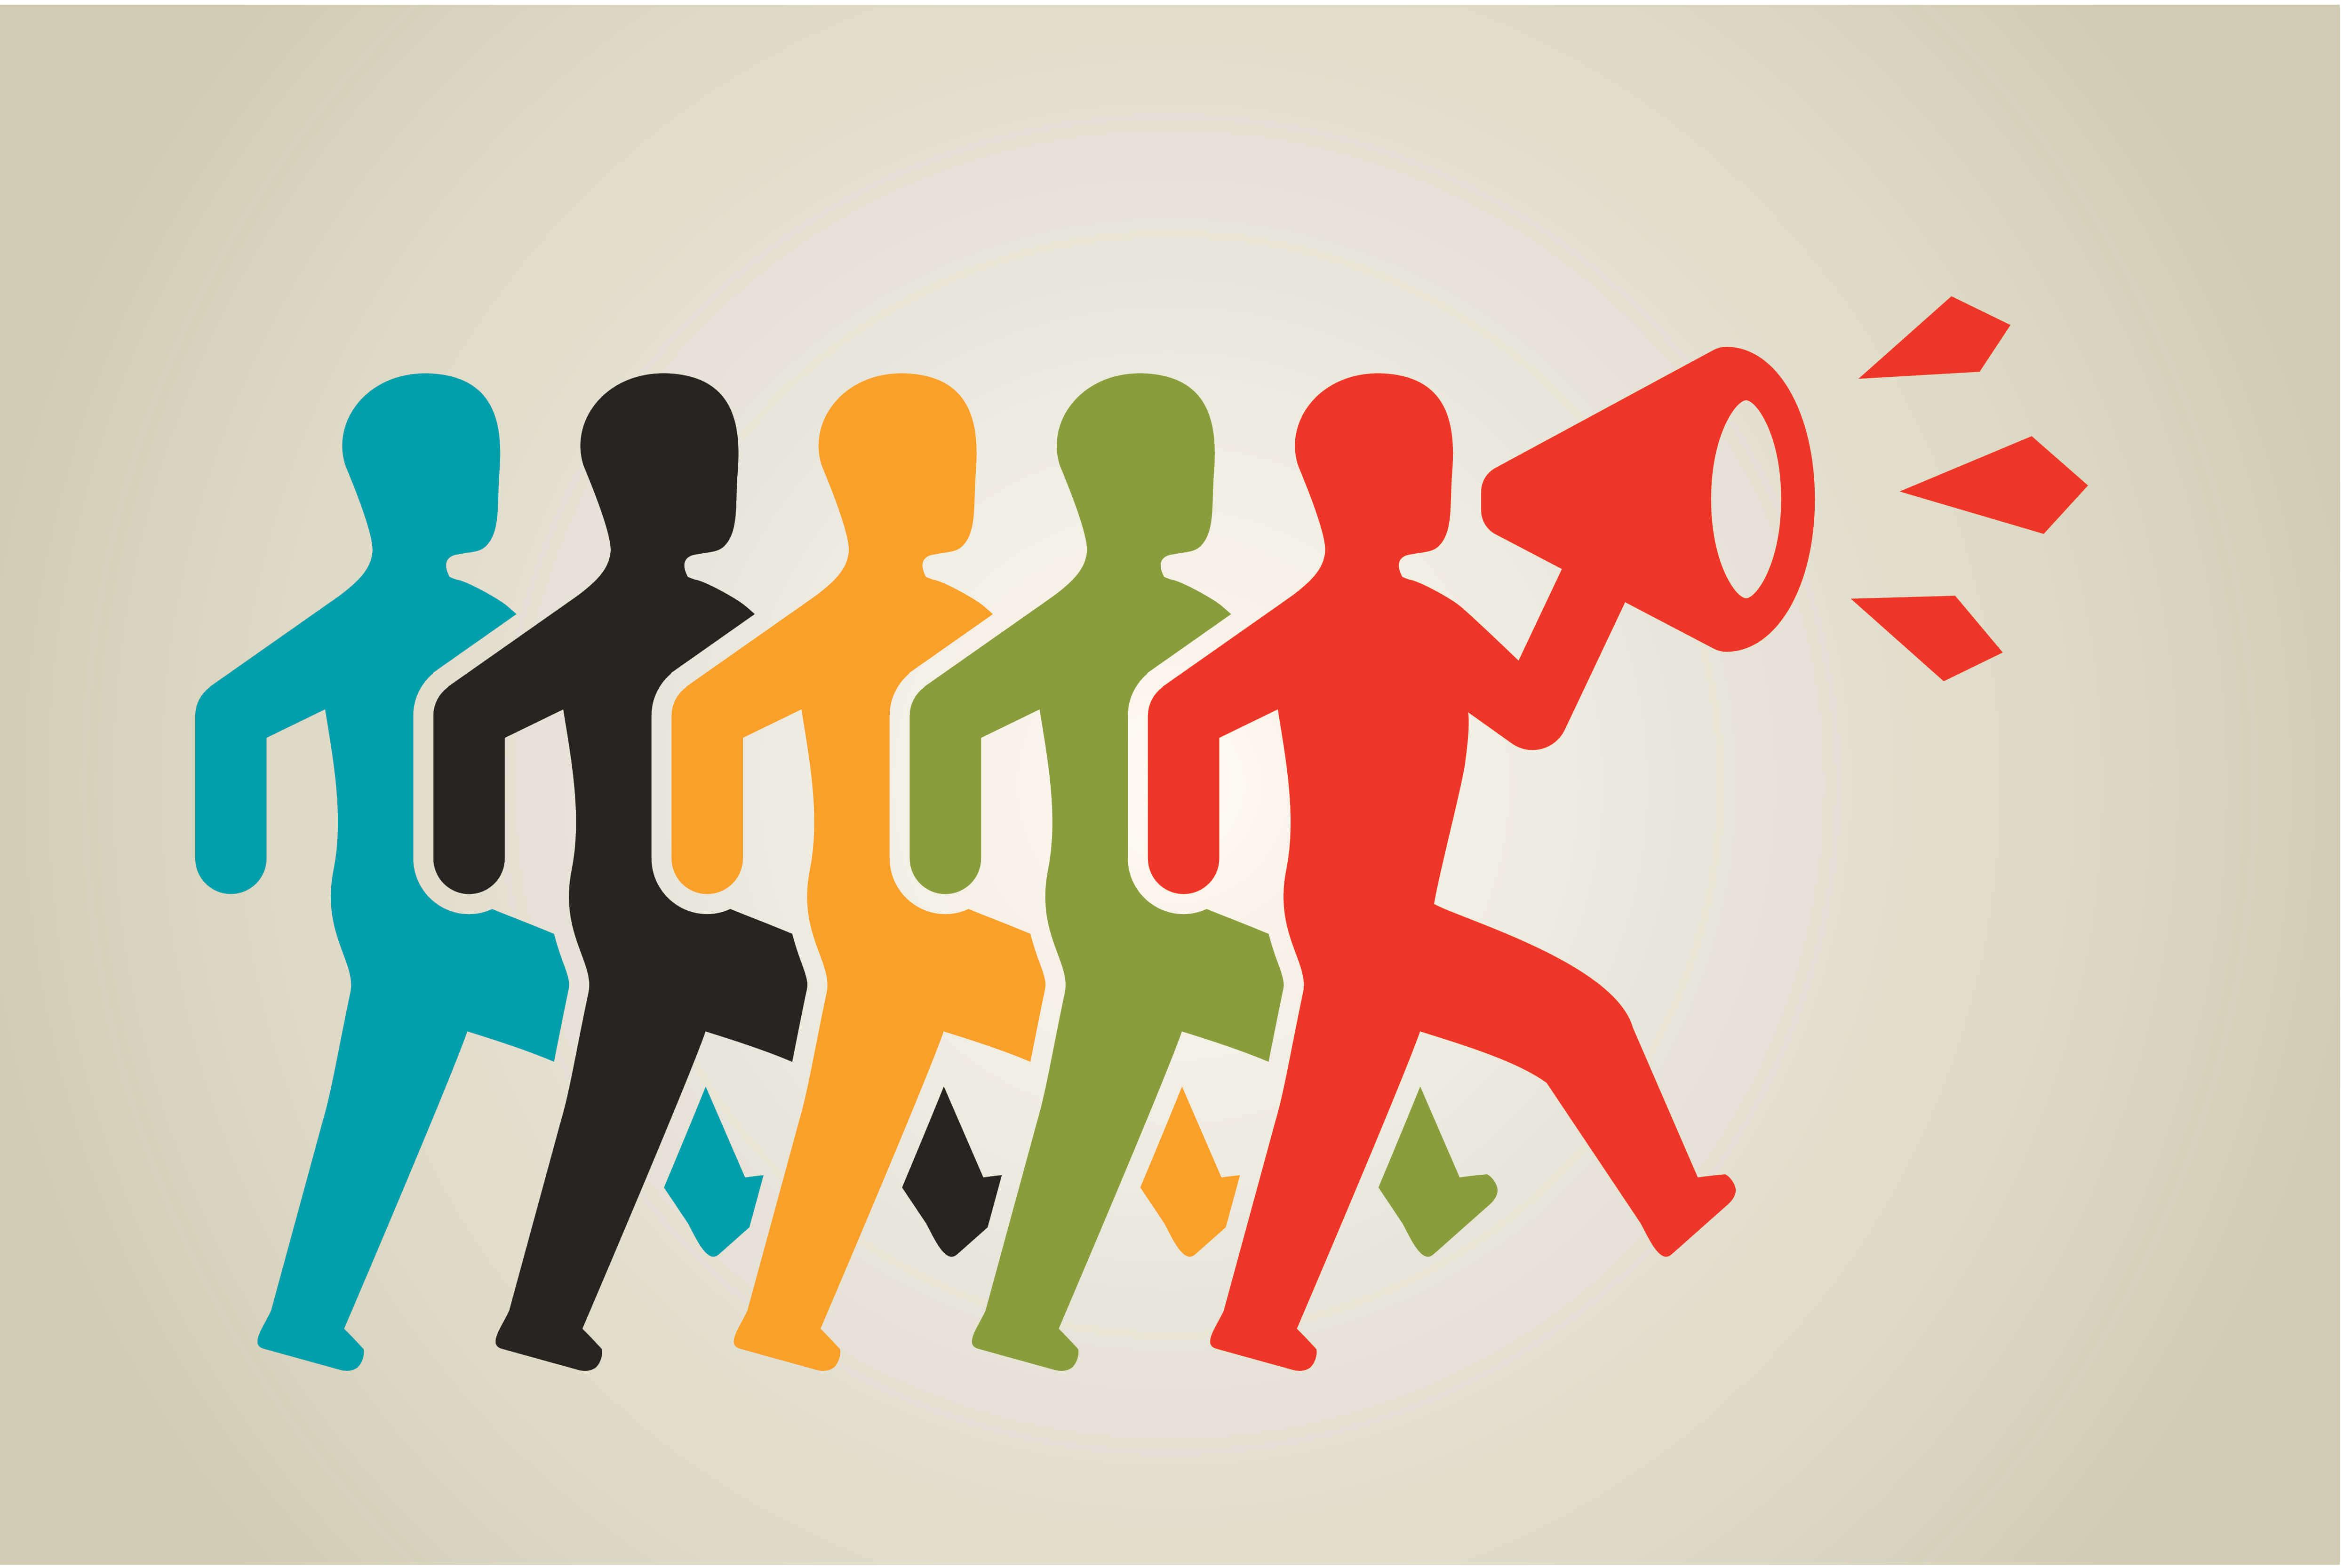 ecommerce, аудитория, бизнес, интернет-маркетинг, контент, стратегия, юзабилити